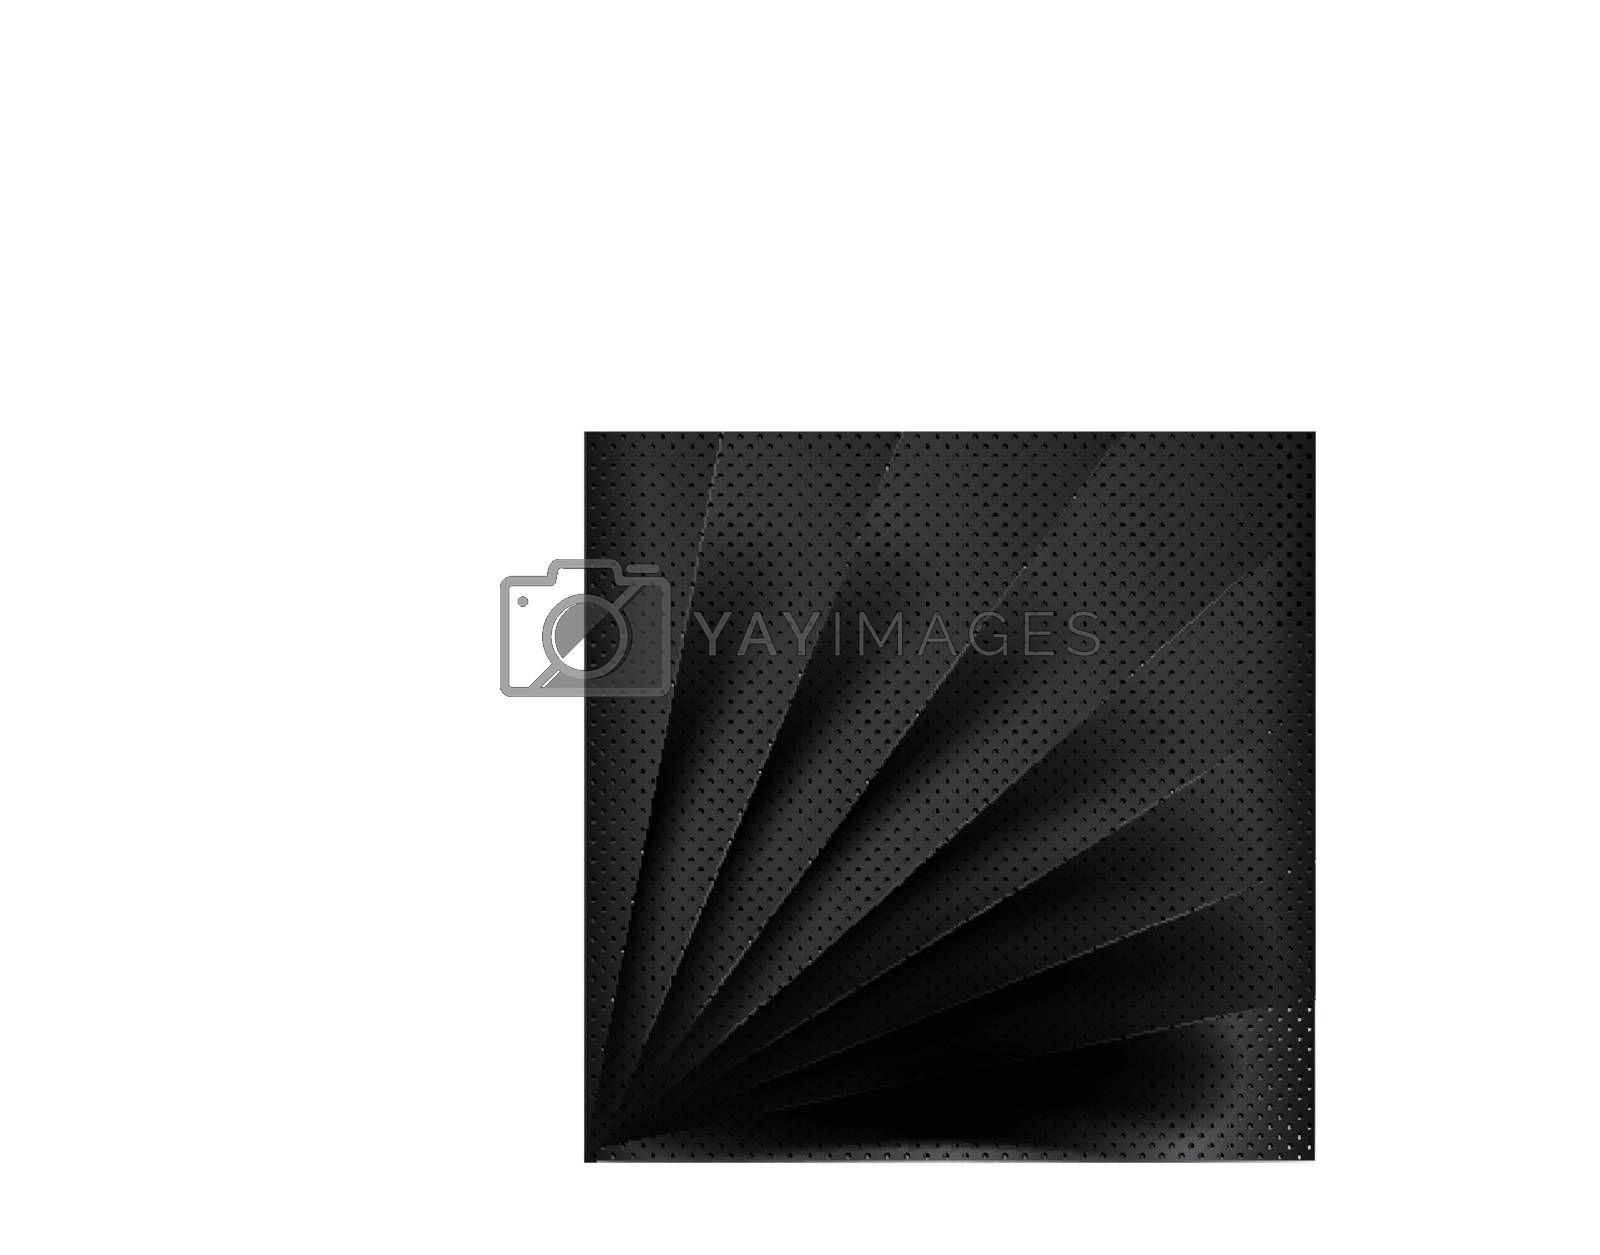 Black metal vector background overlap multi paper lighting for text and message website design